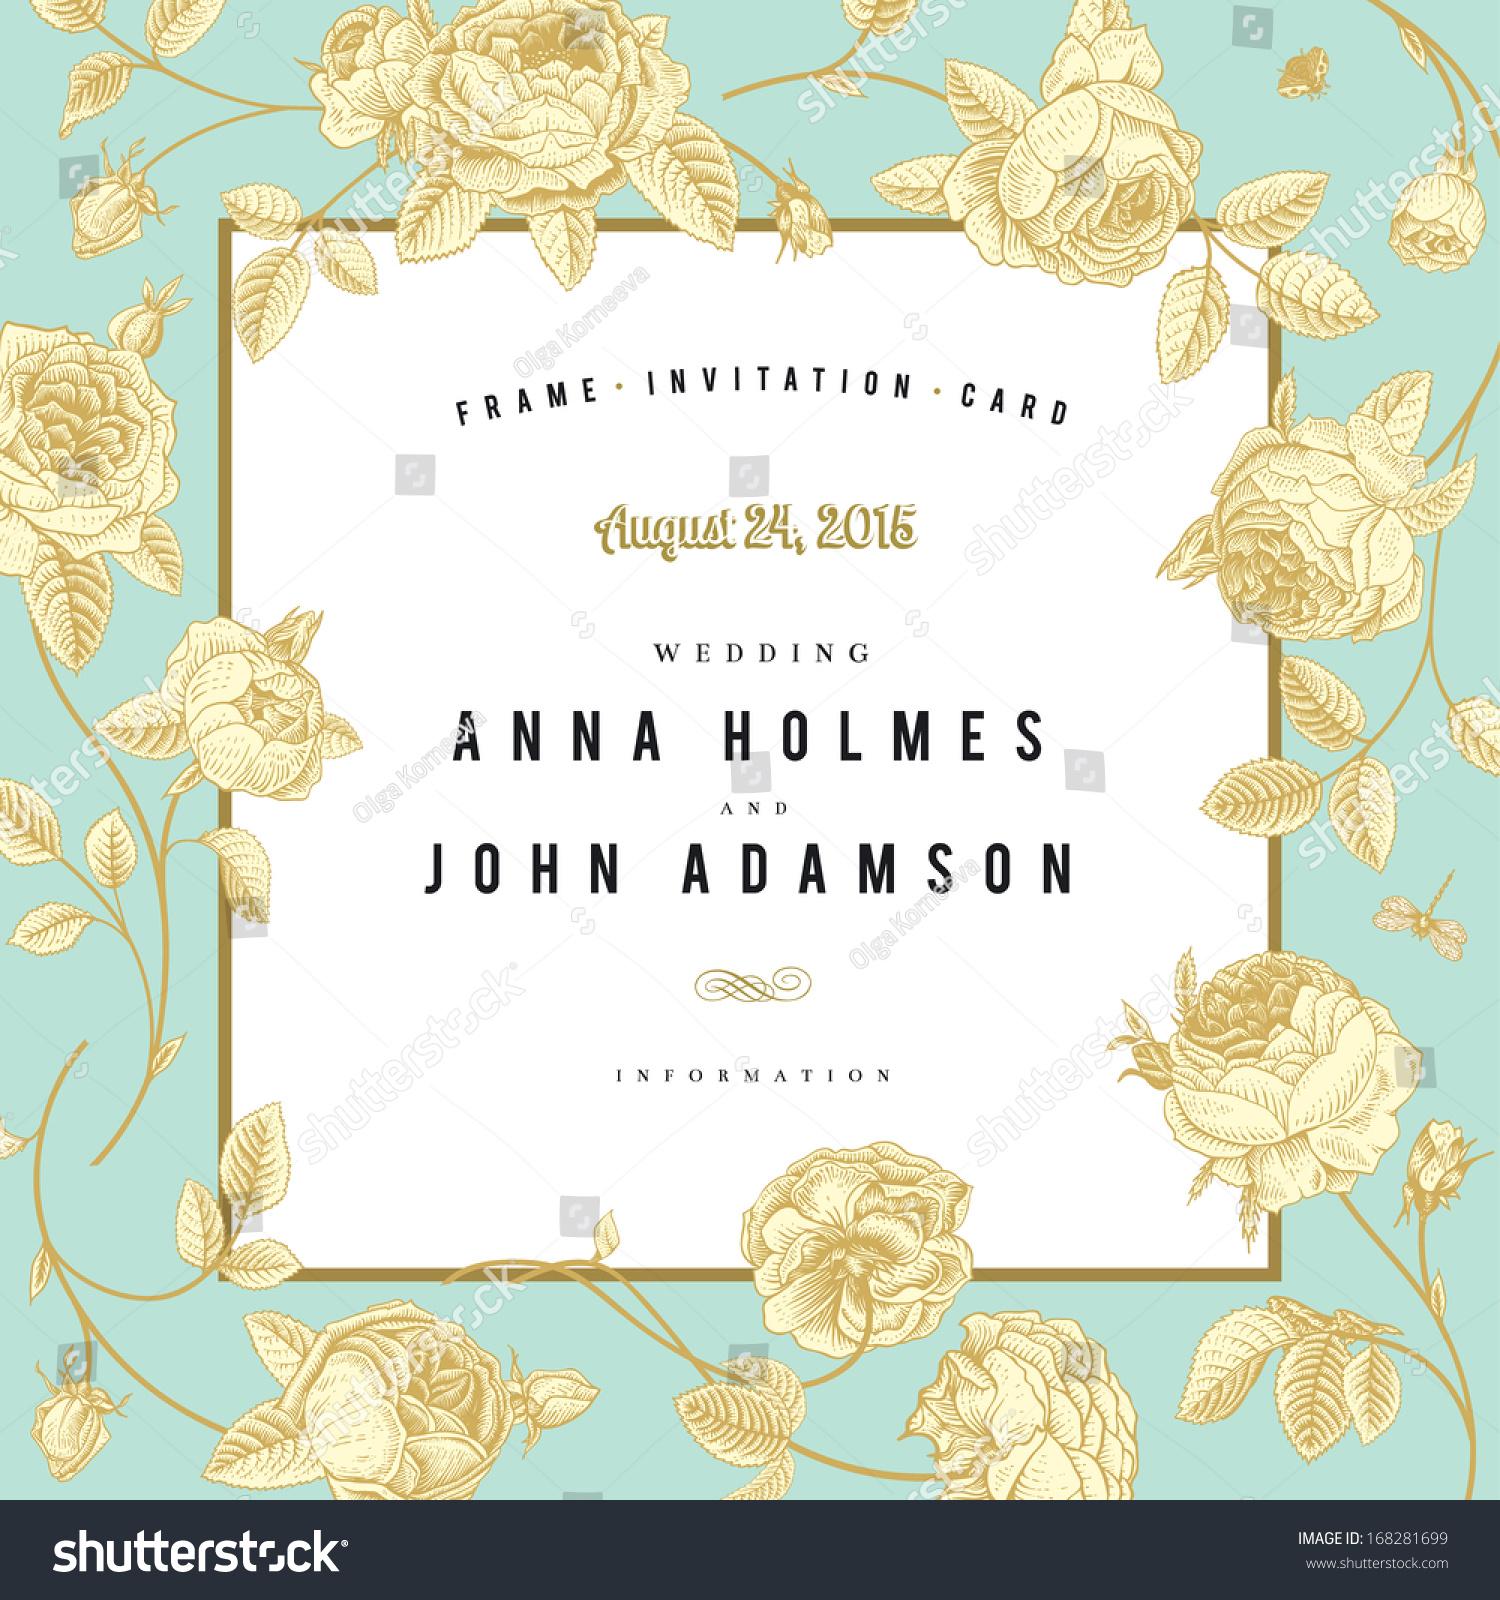 Hydrangea Invitations with amazing invitations sample